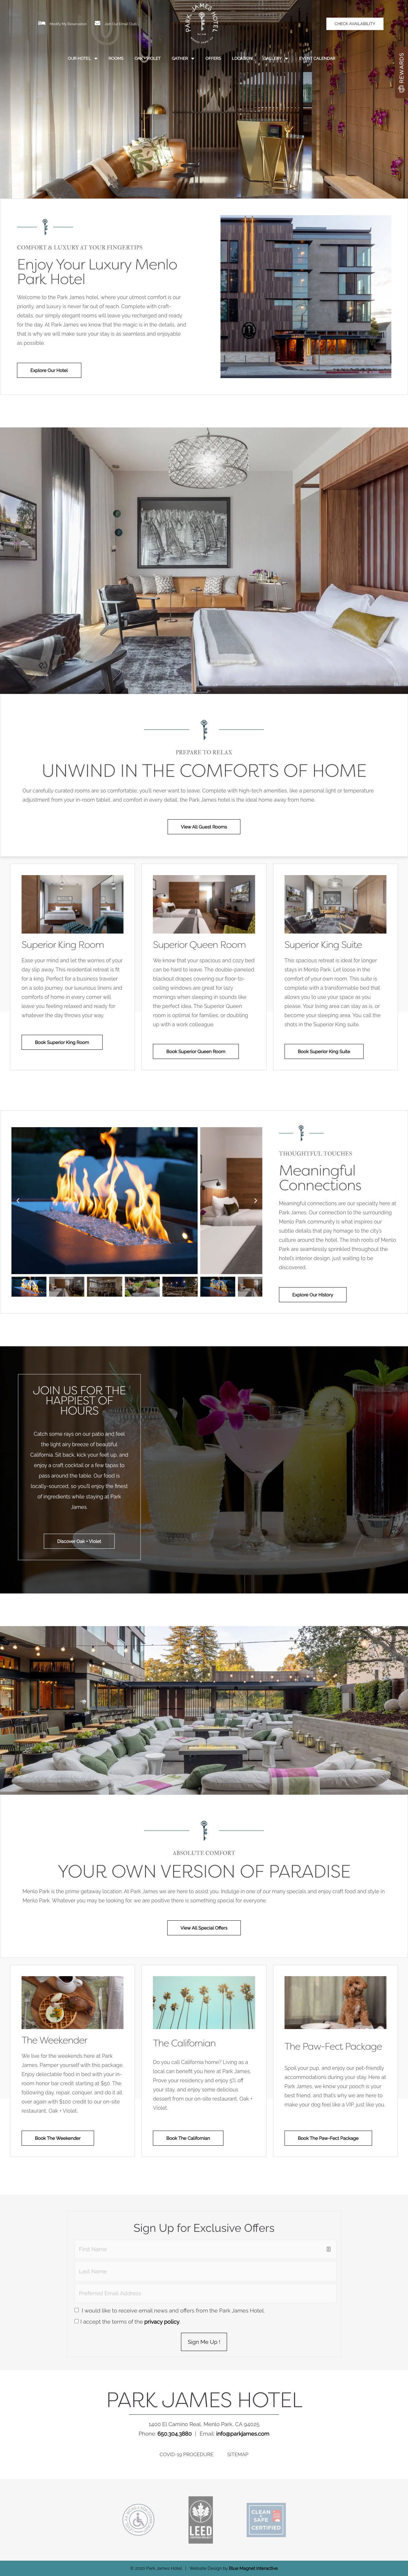 web design example park james